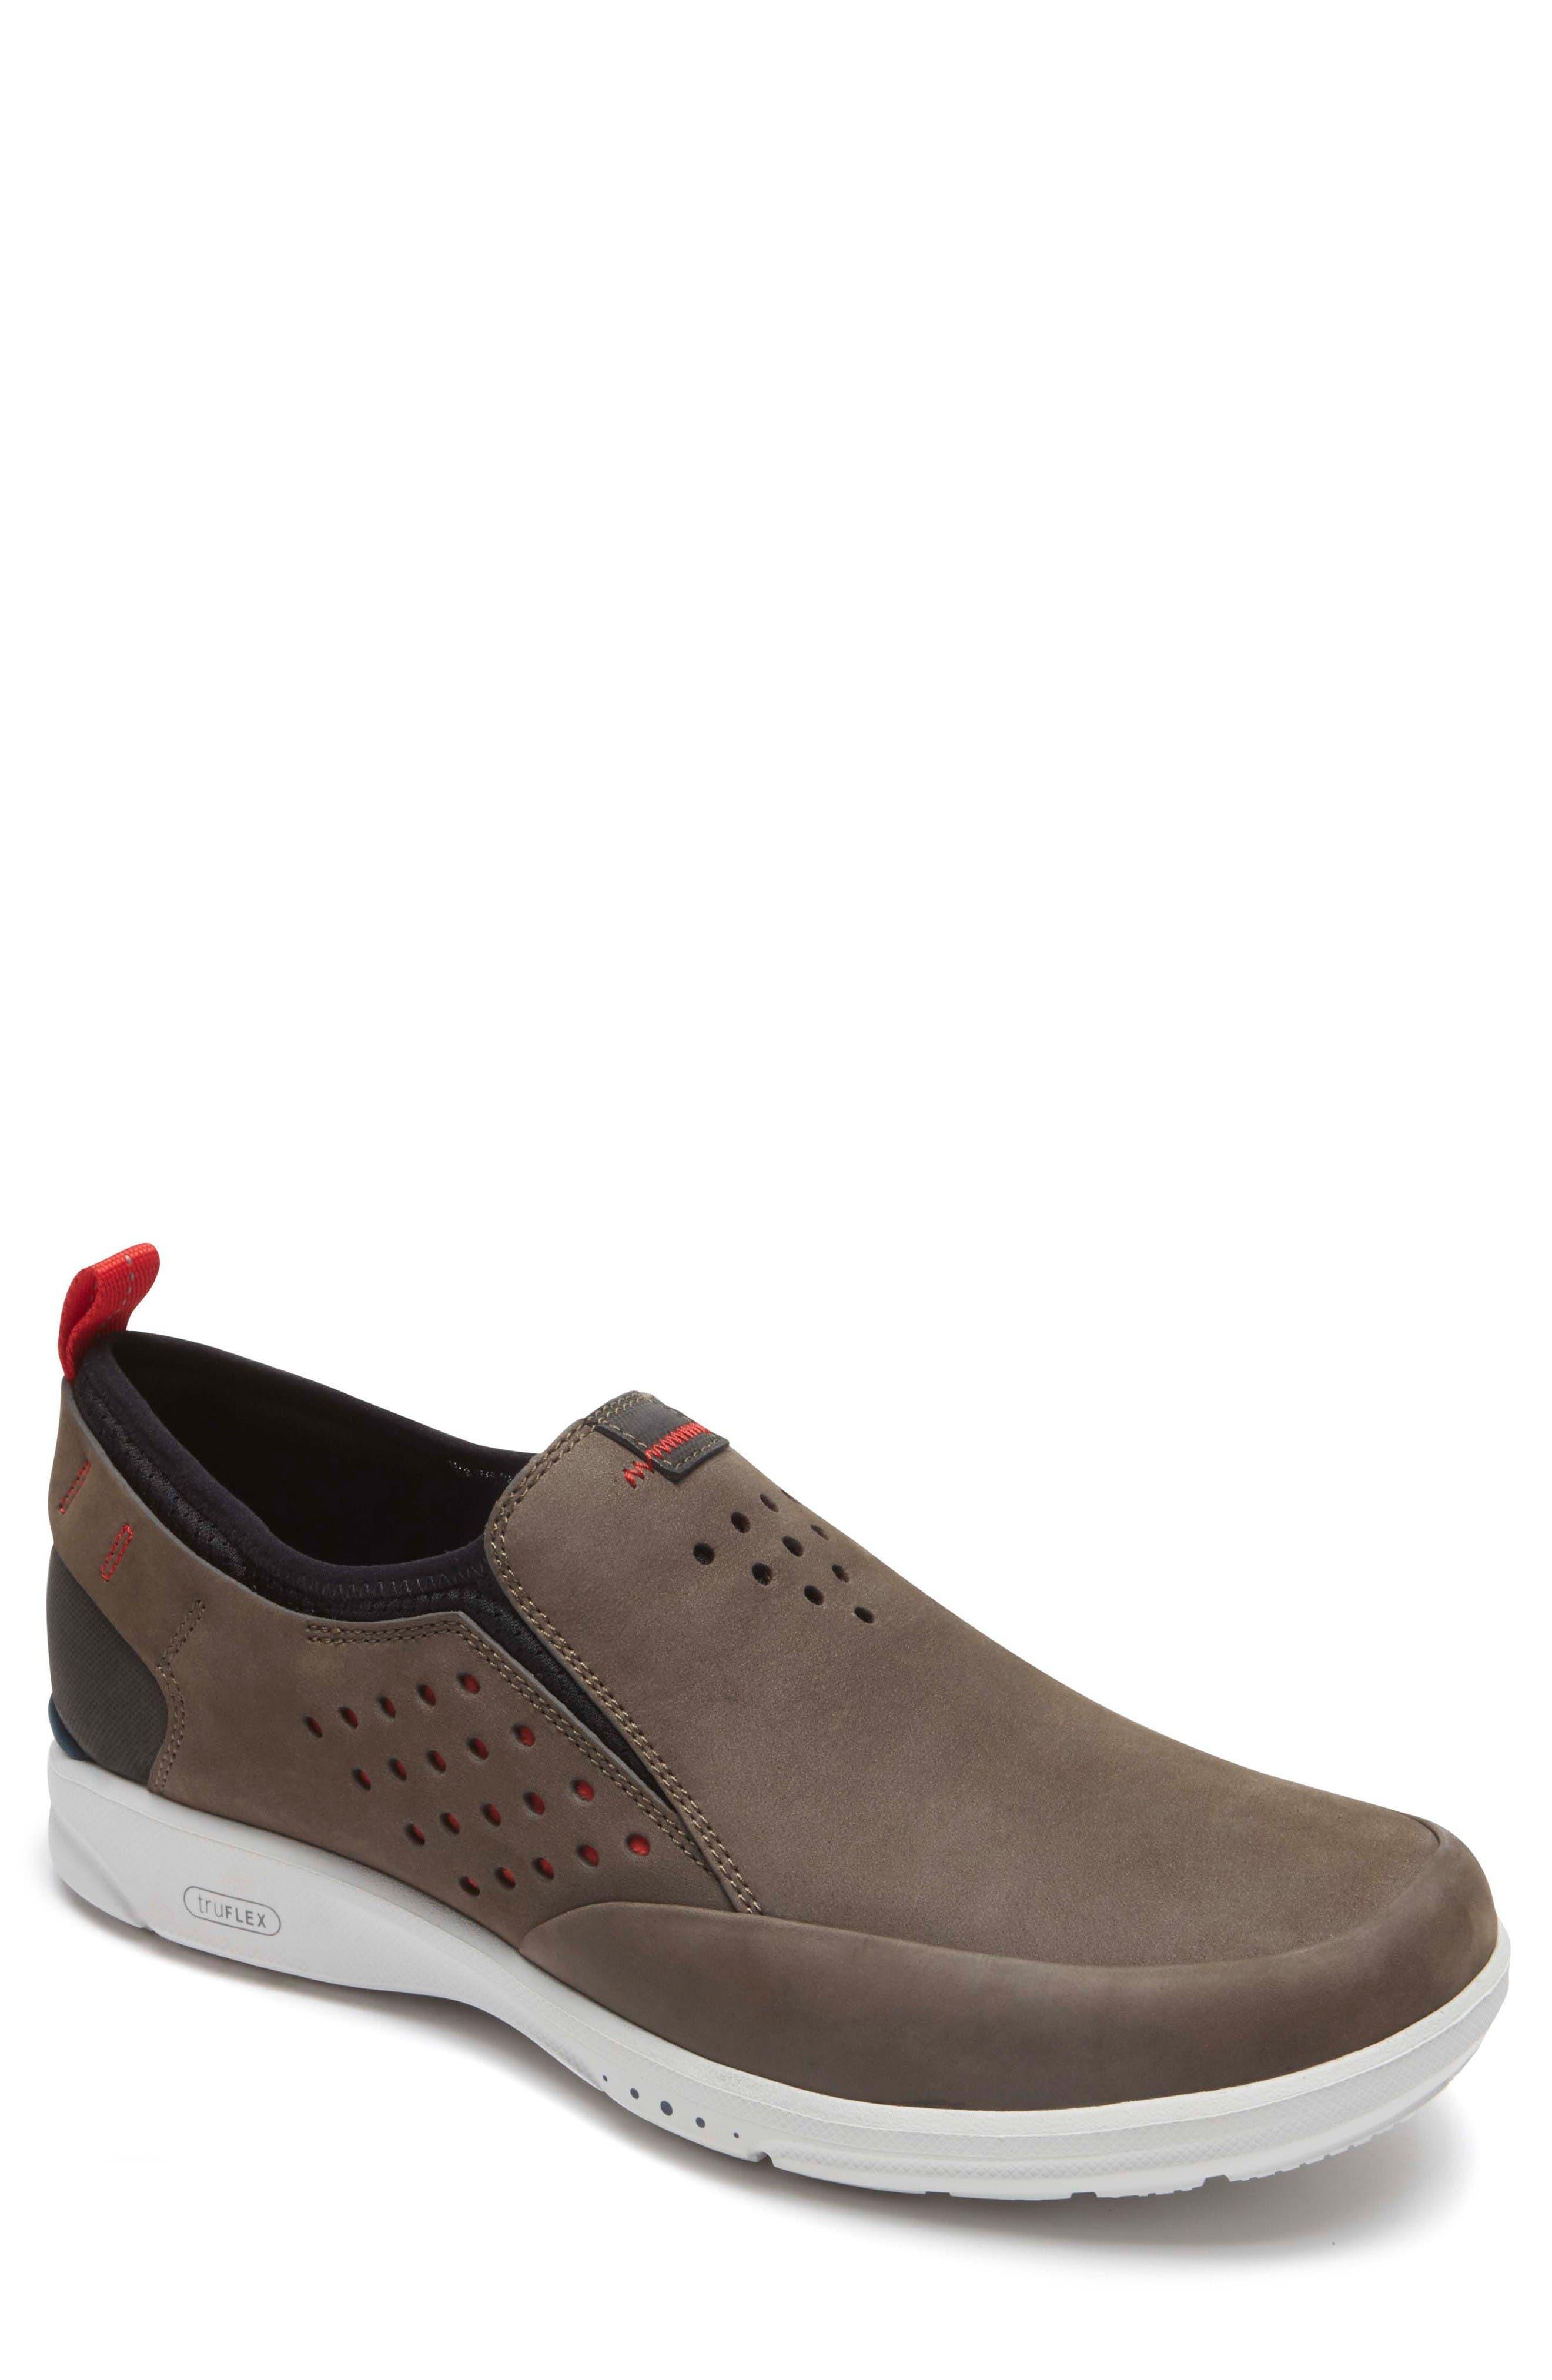 Truflex Slip-On,                         Main,                         color, Dark Olive Leather